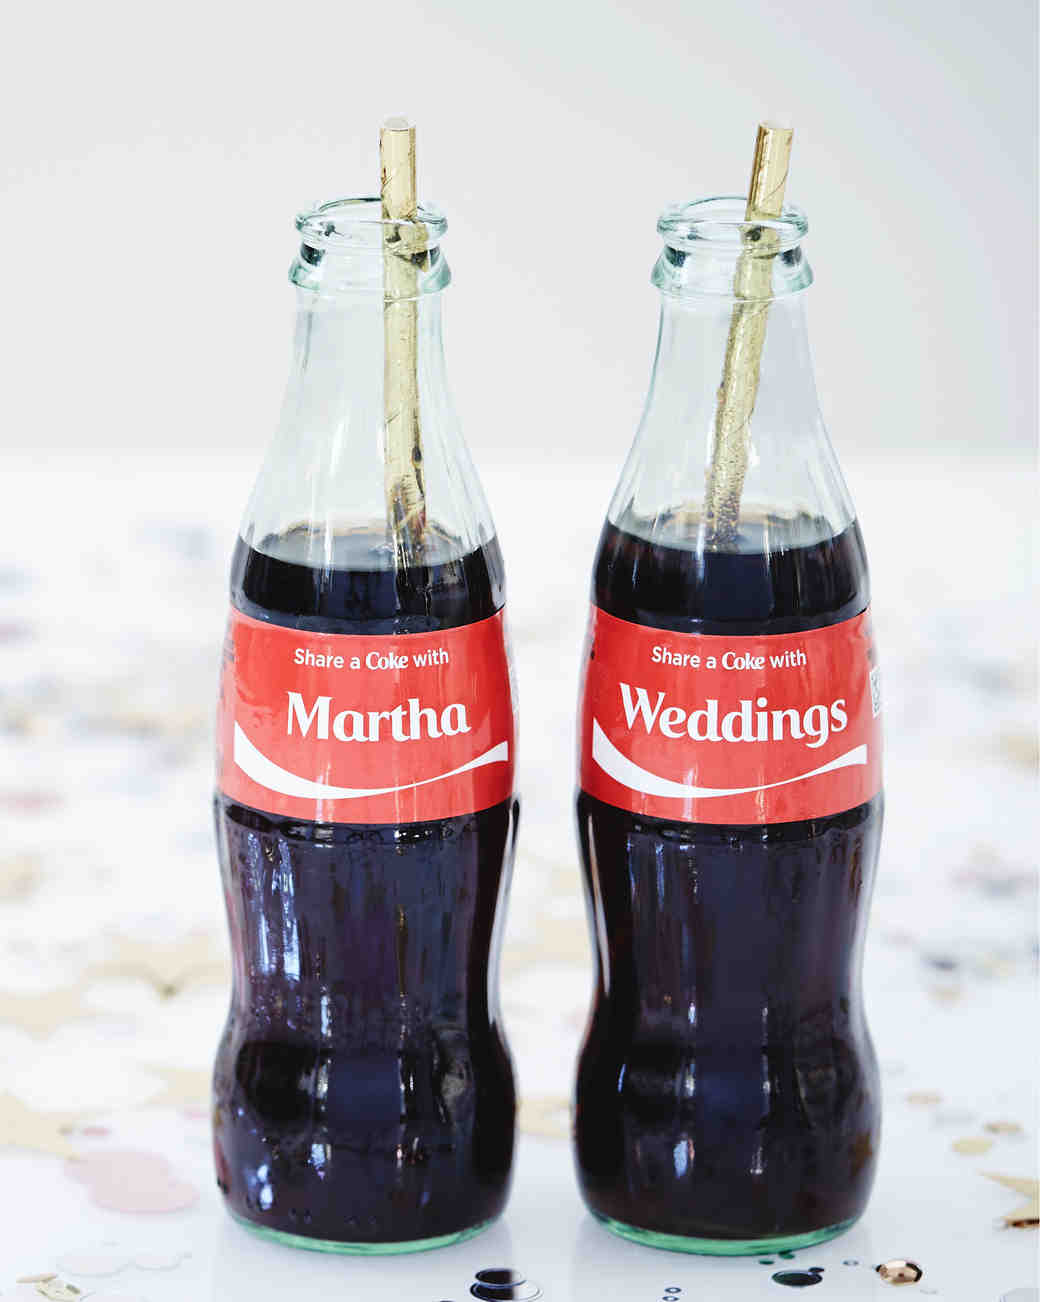 martha-weddings-party-2015-christian-oth-coke-151012-0088-1015.jpg